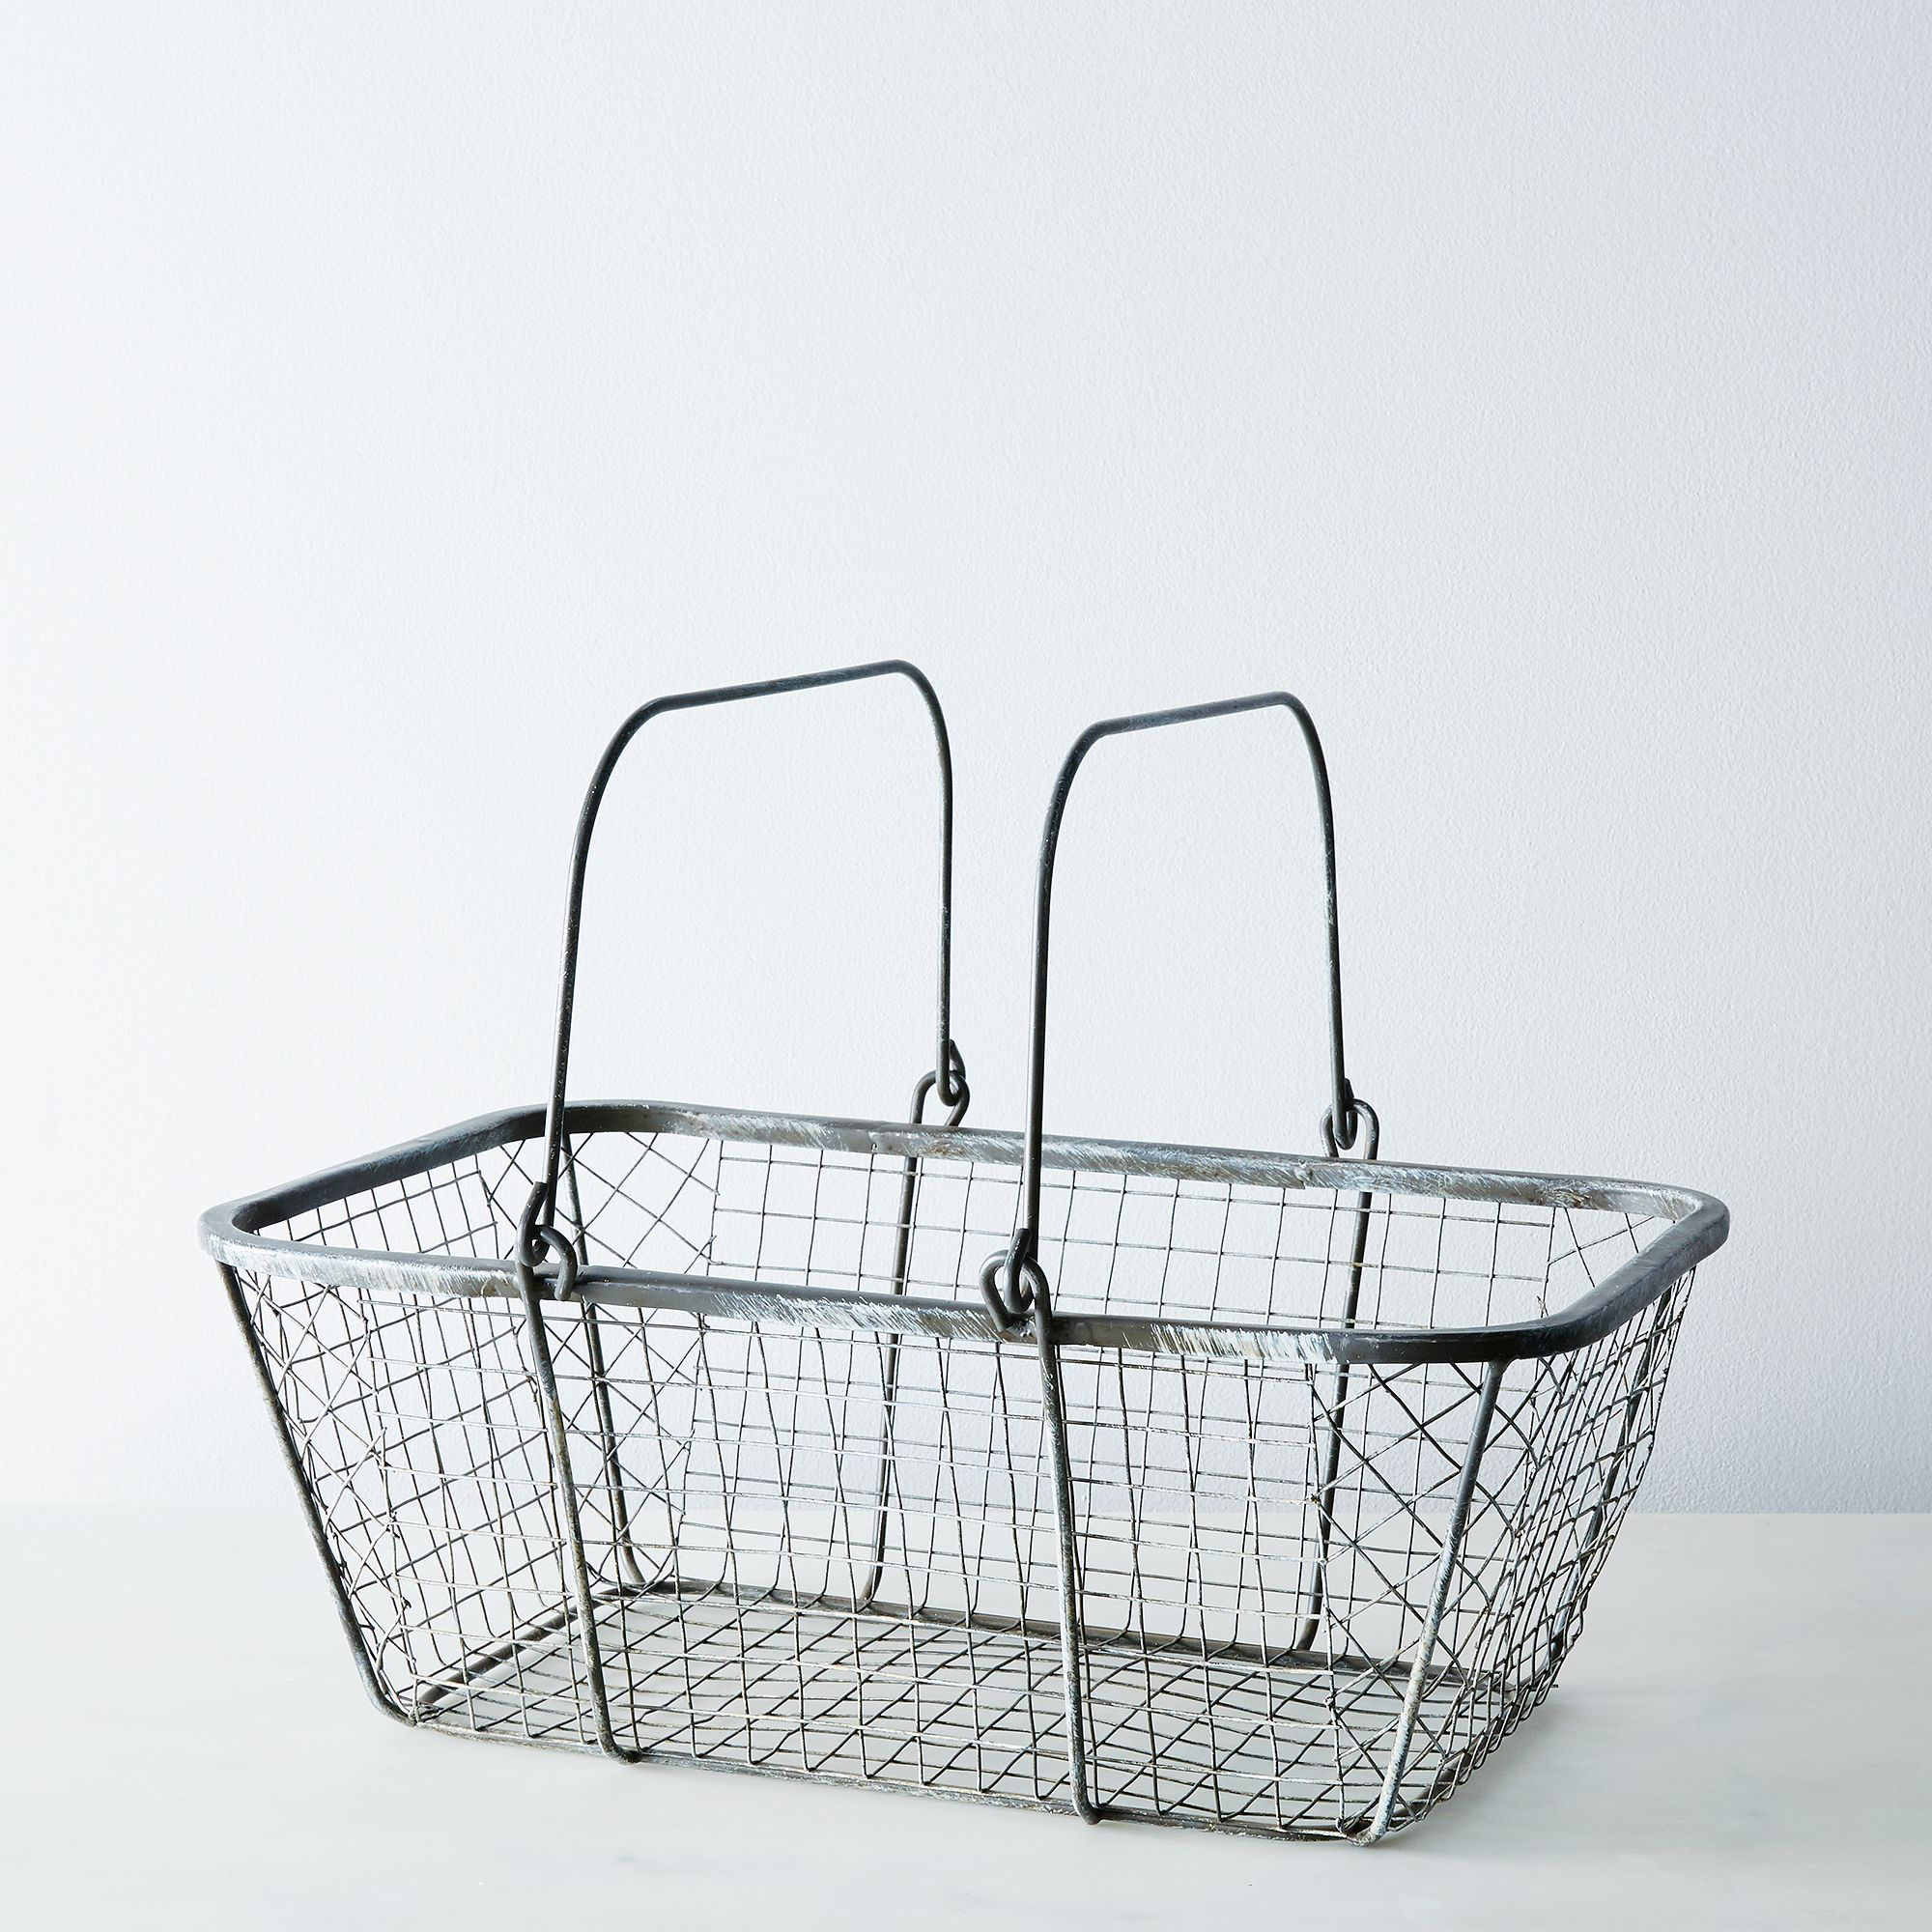 5f4debfa b18a 40d5 a461 c19097c97566  2015 0710 lostine wire bread basket silo james ransom 001